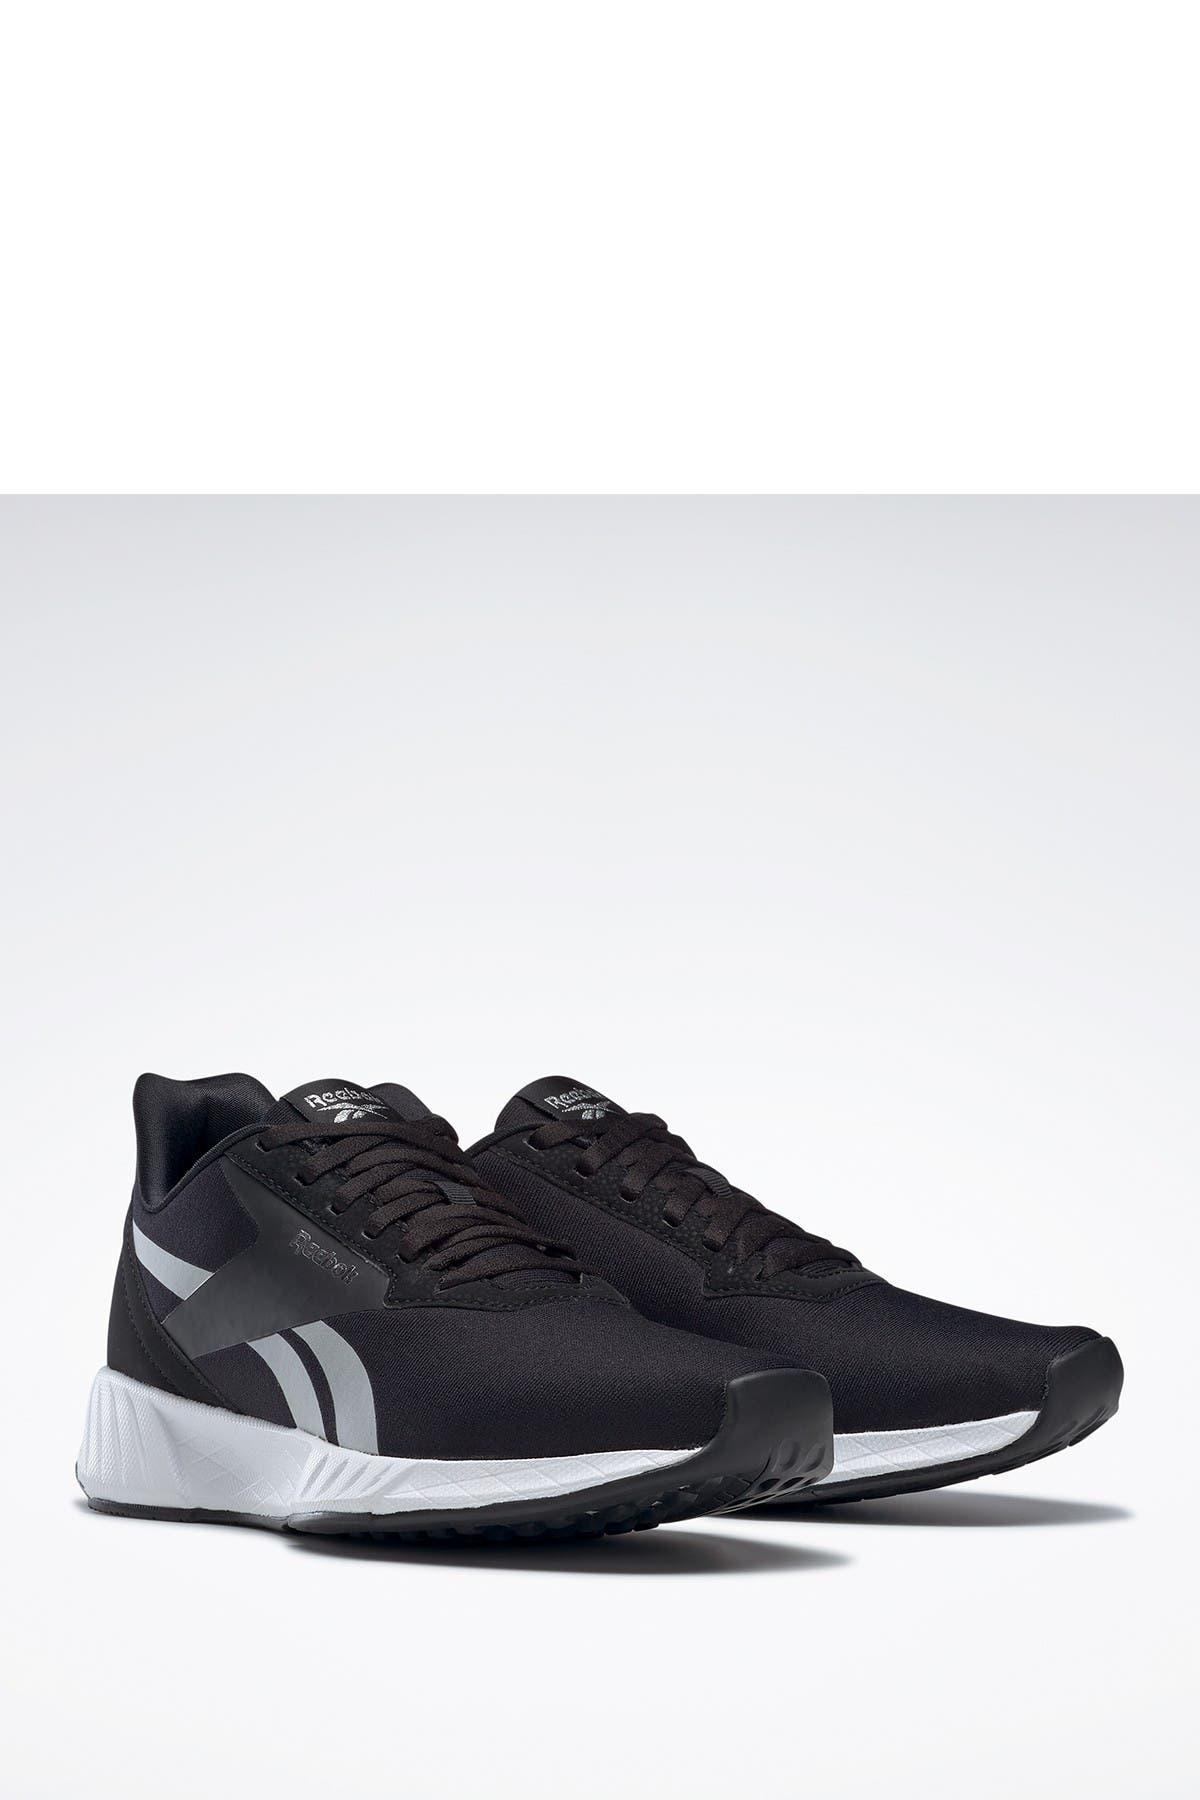 Image of Reebok Lite Plus 2.0 Running Sneaker